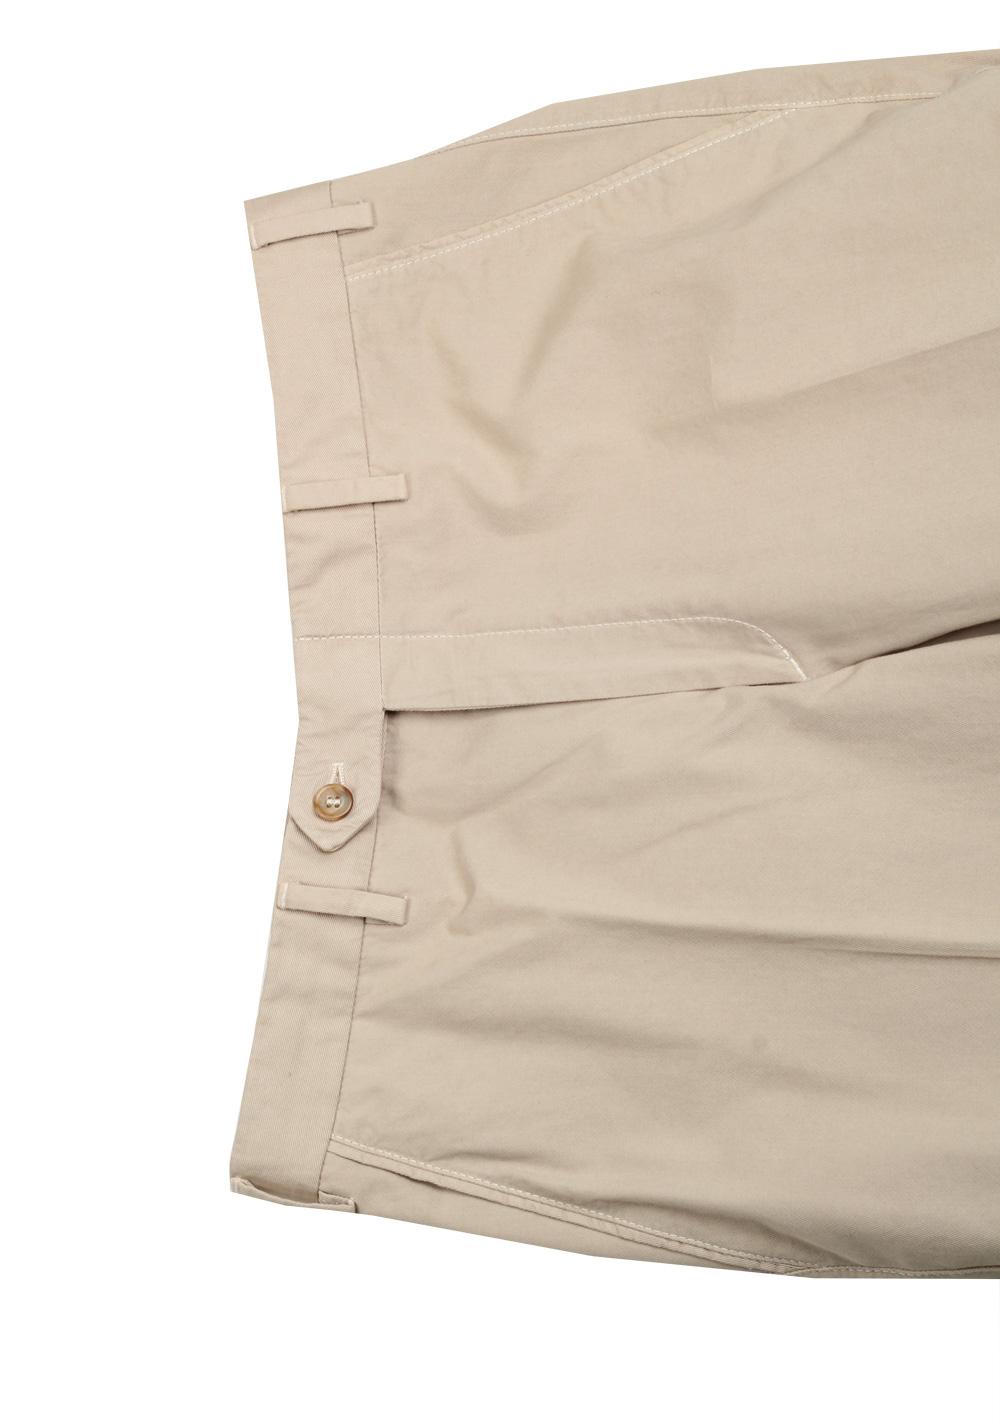 Brioni Beige Trousers Size 46 / 30 U.S.   Costume Limité